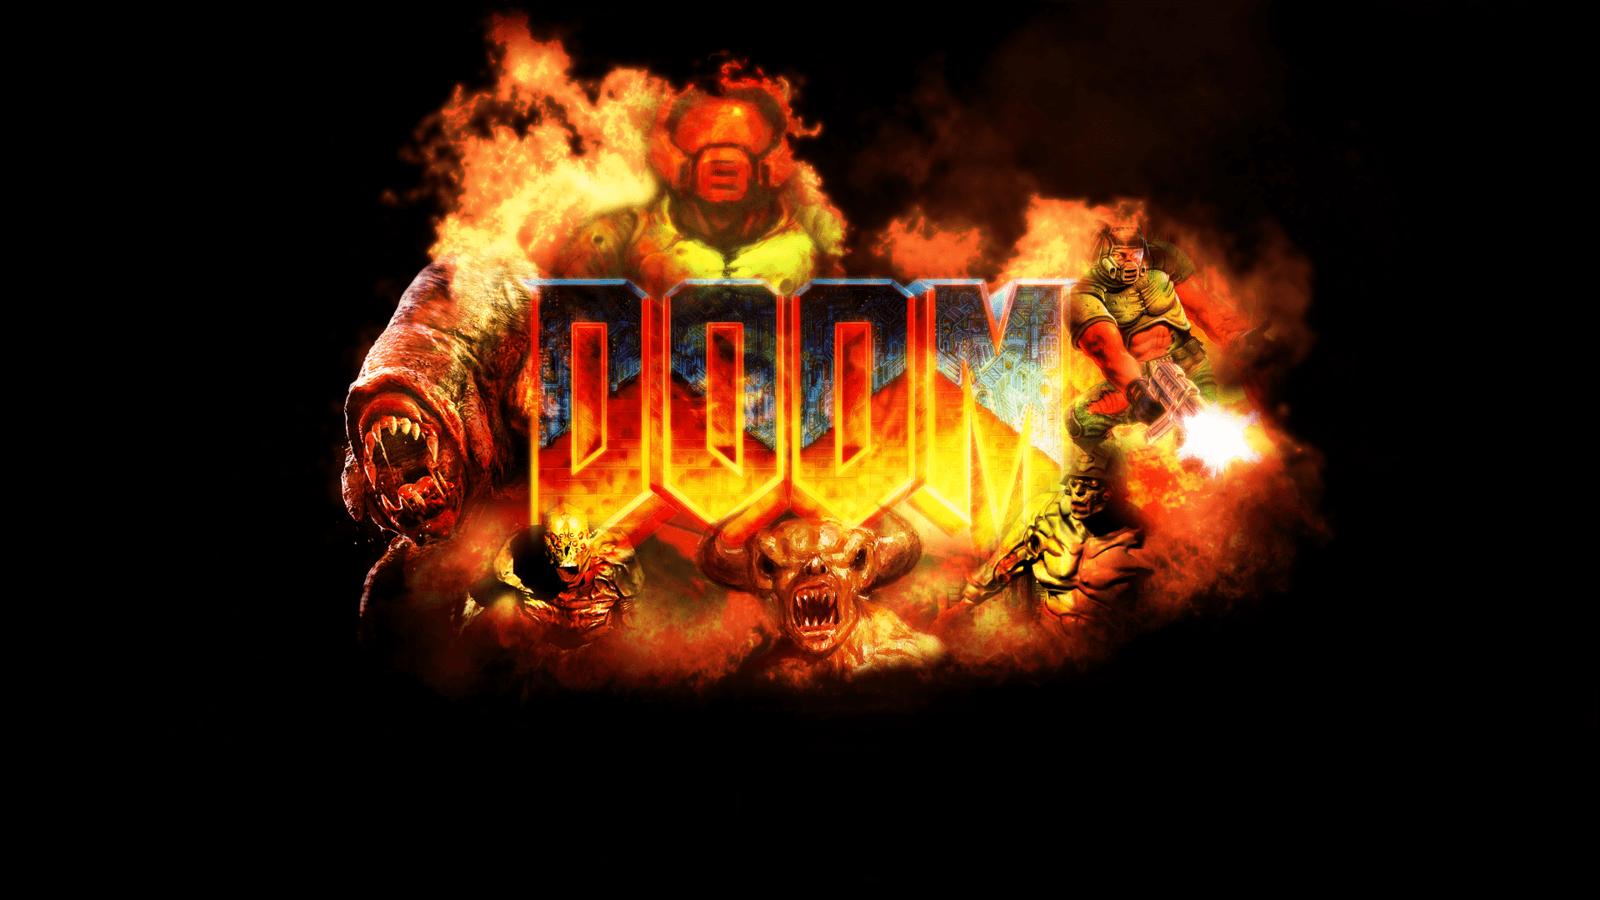 brutal doom wallpaper - photo #32